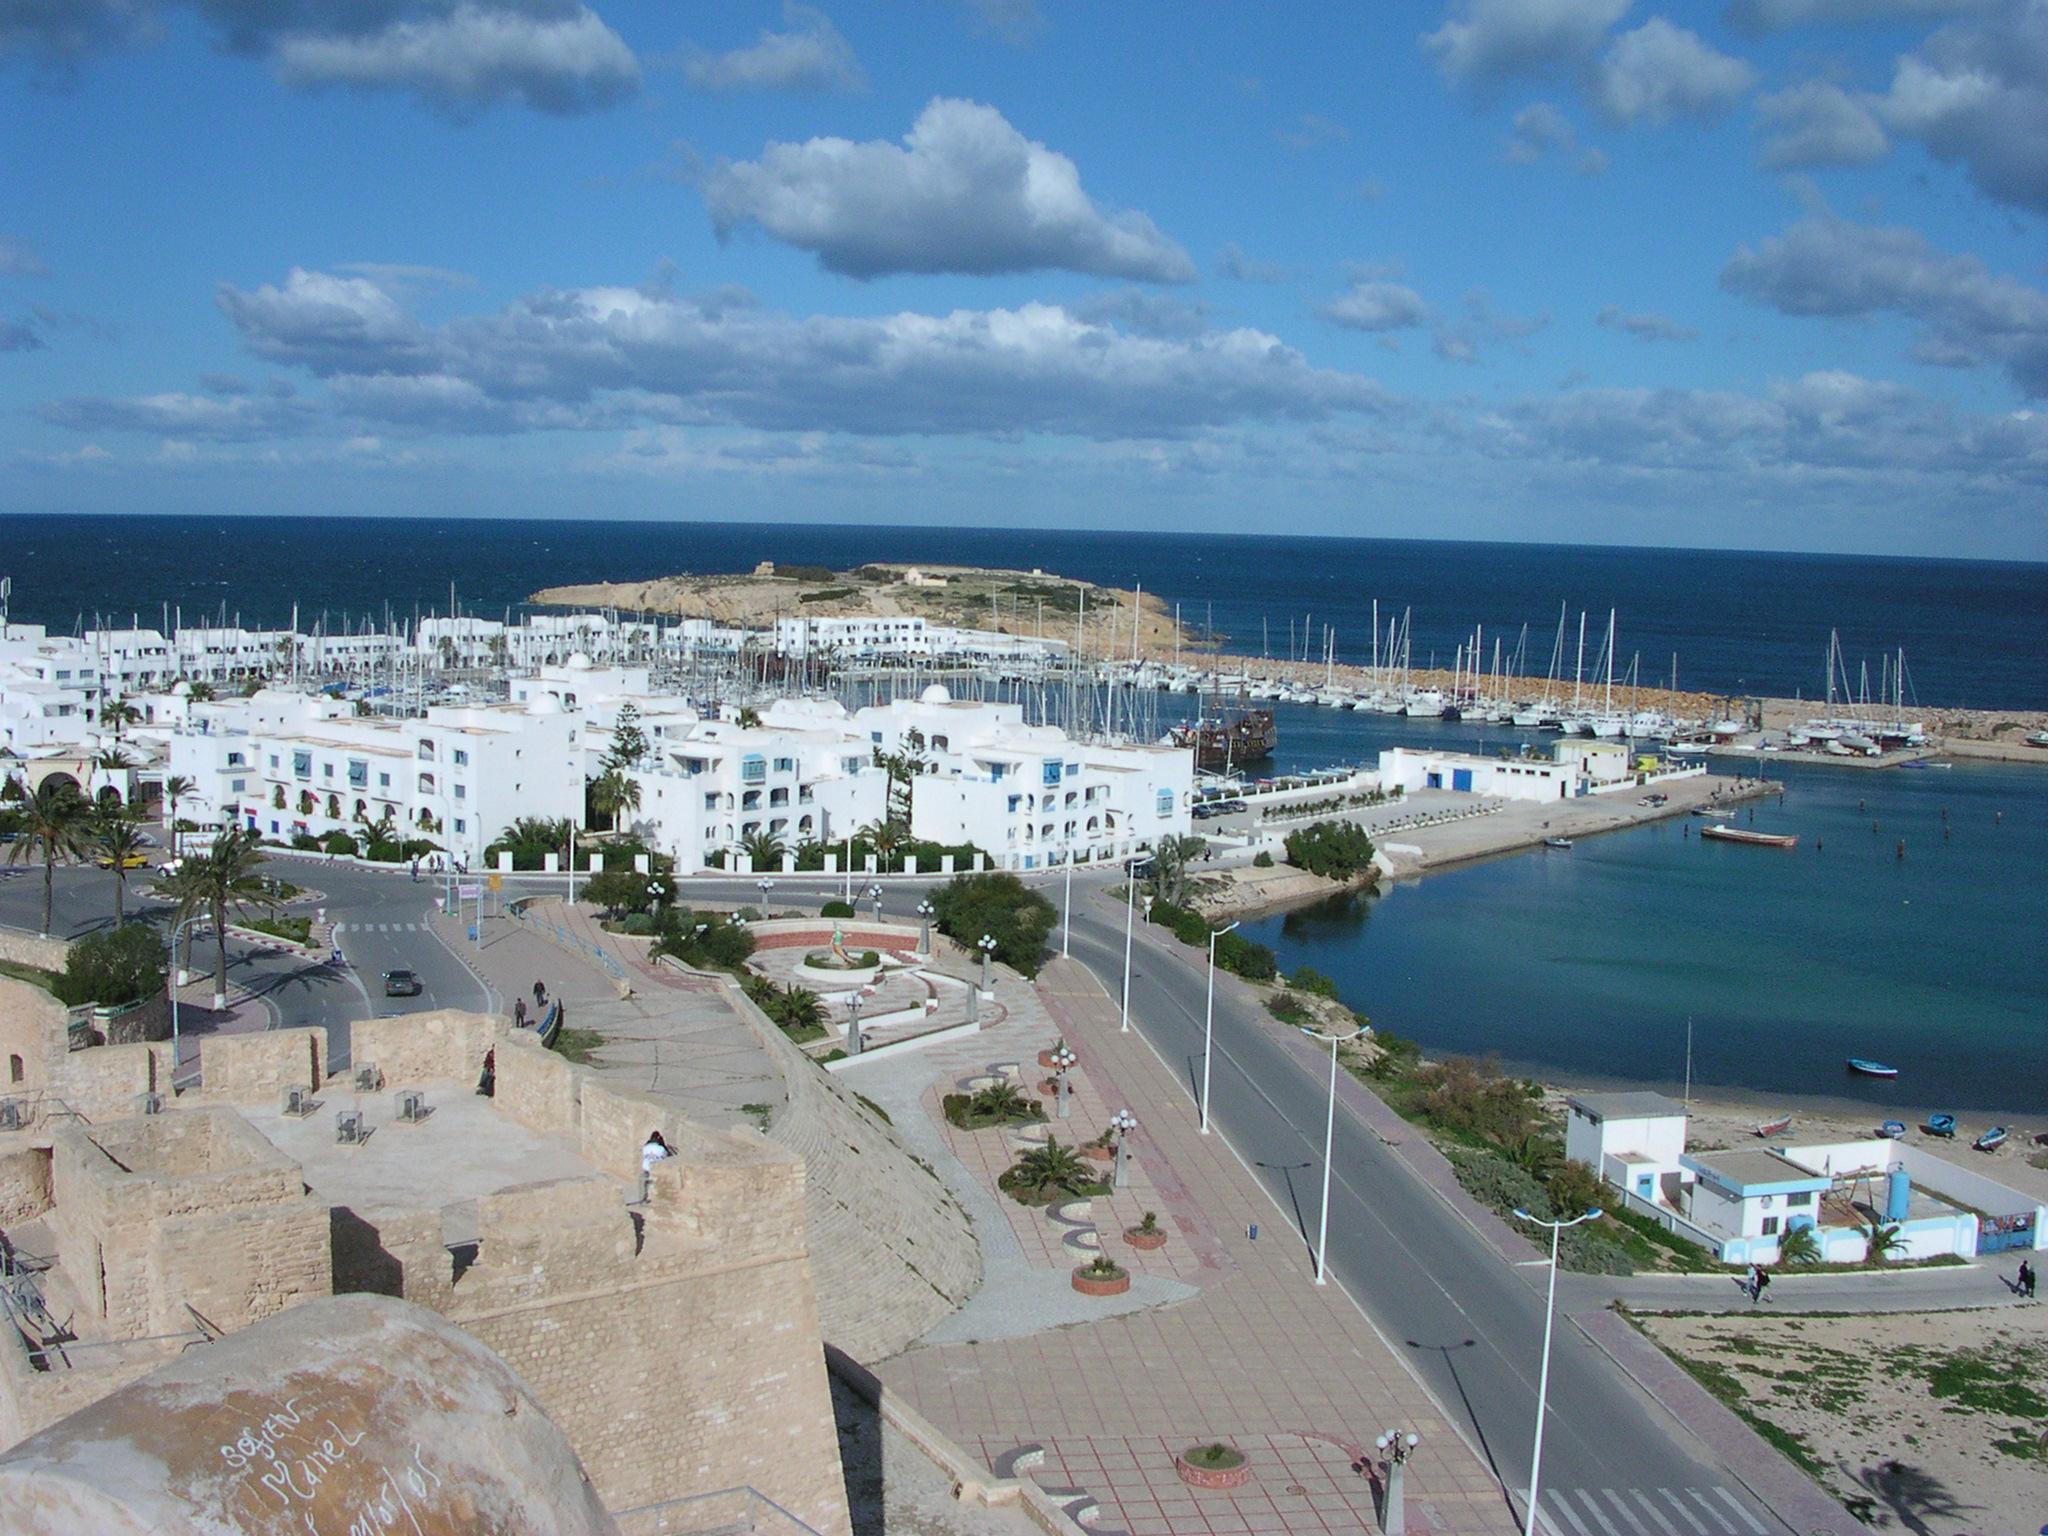 File:Port de plaisance, Monastir.jpg - Wikimedia Commons